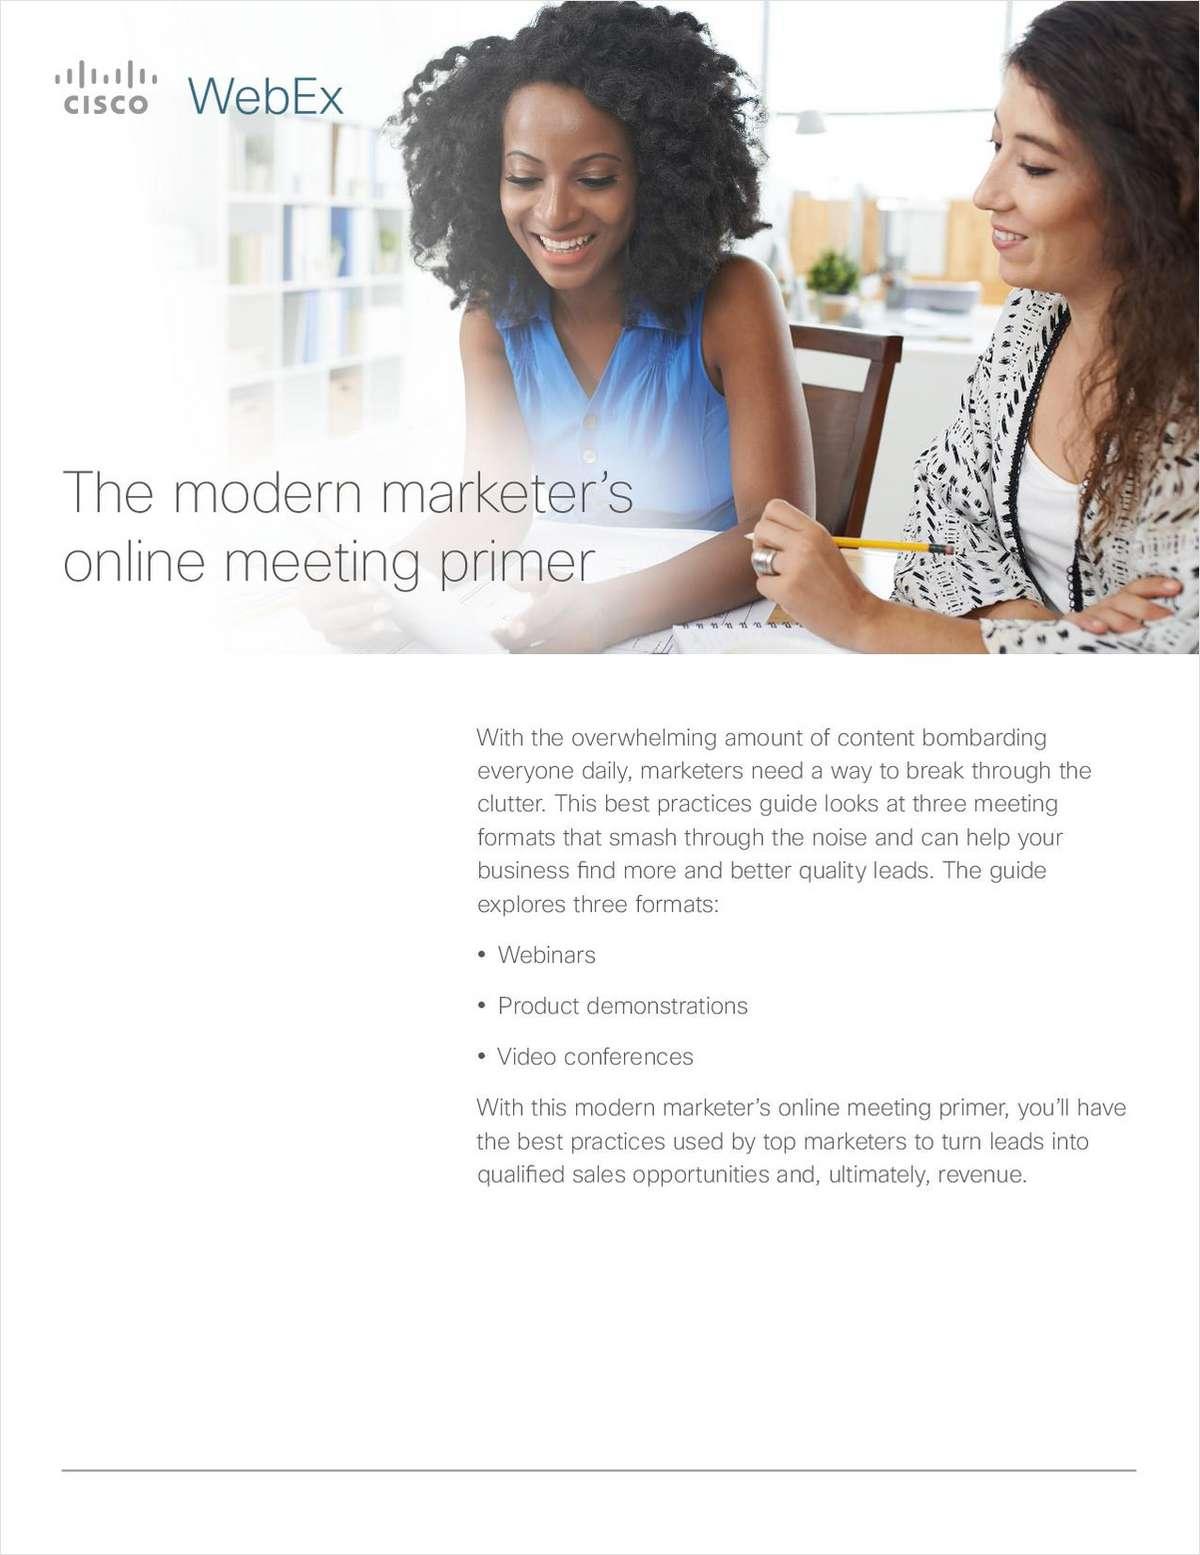 The Modern Marketer's Online Meeting Primer